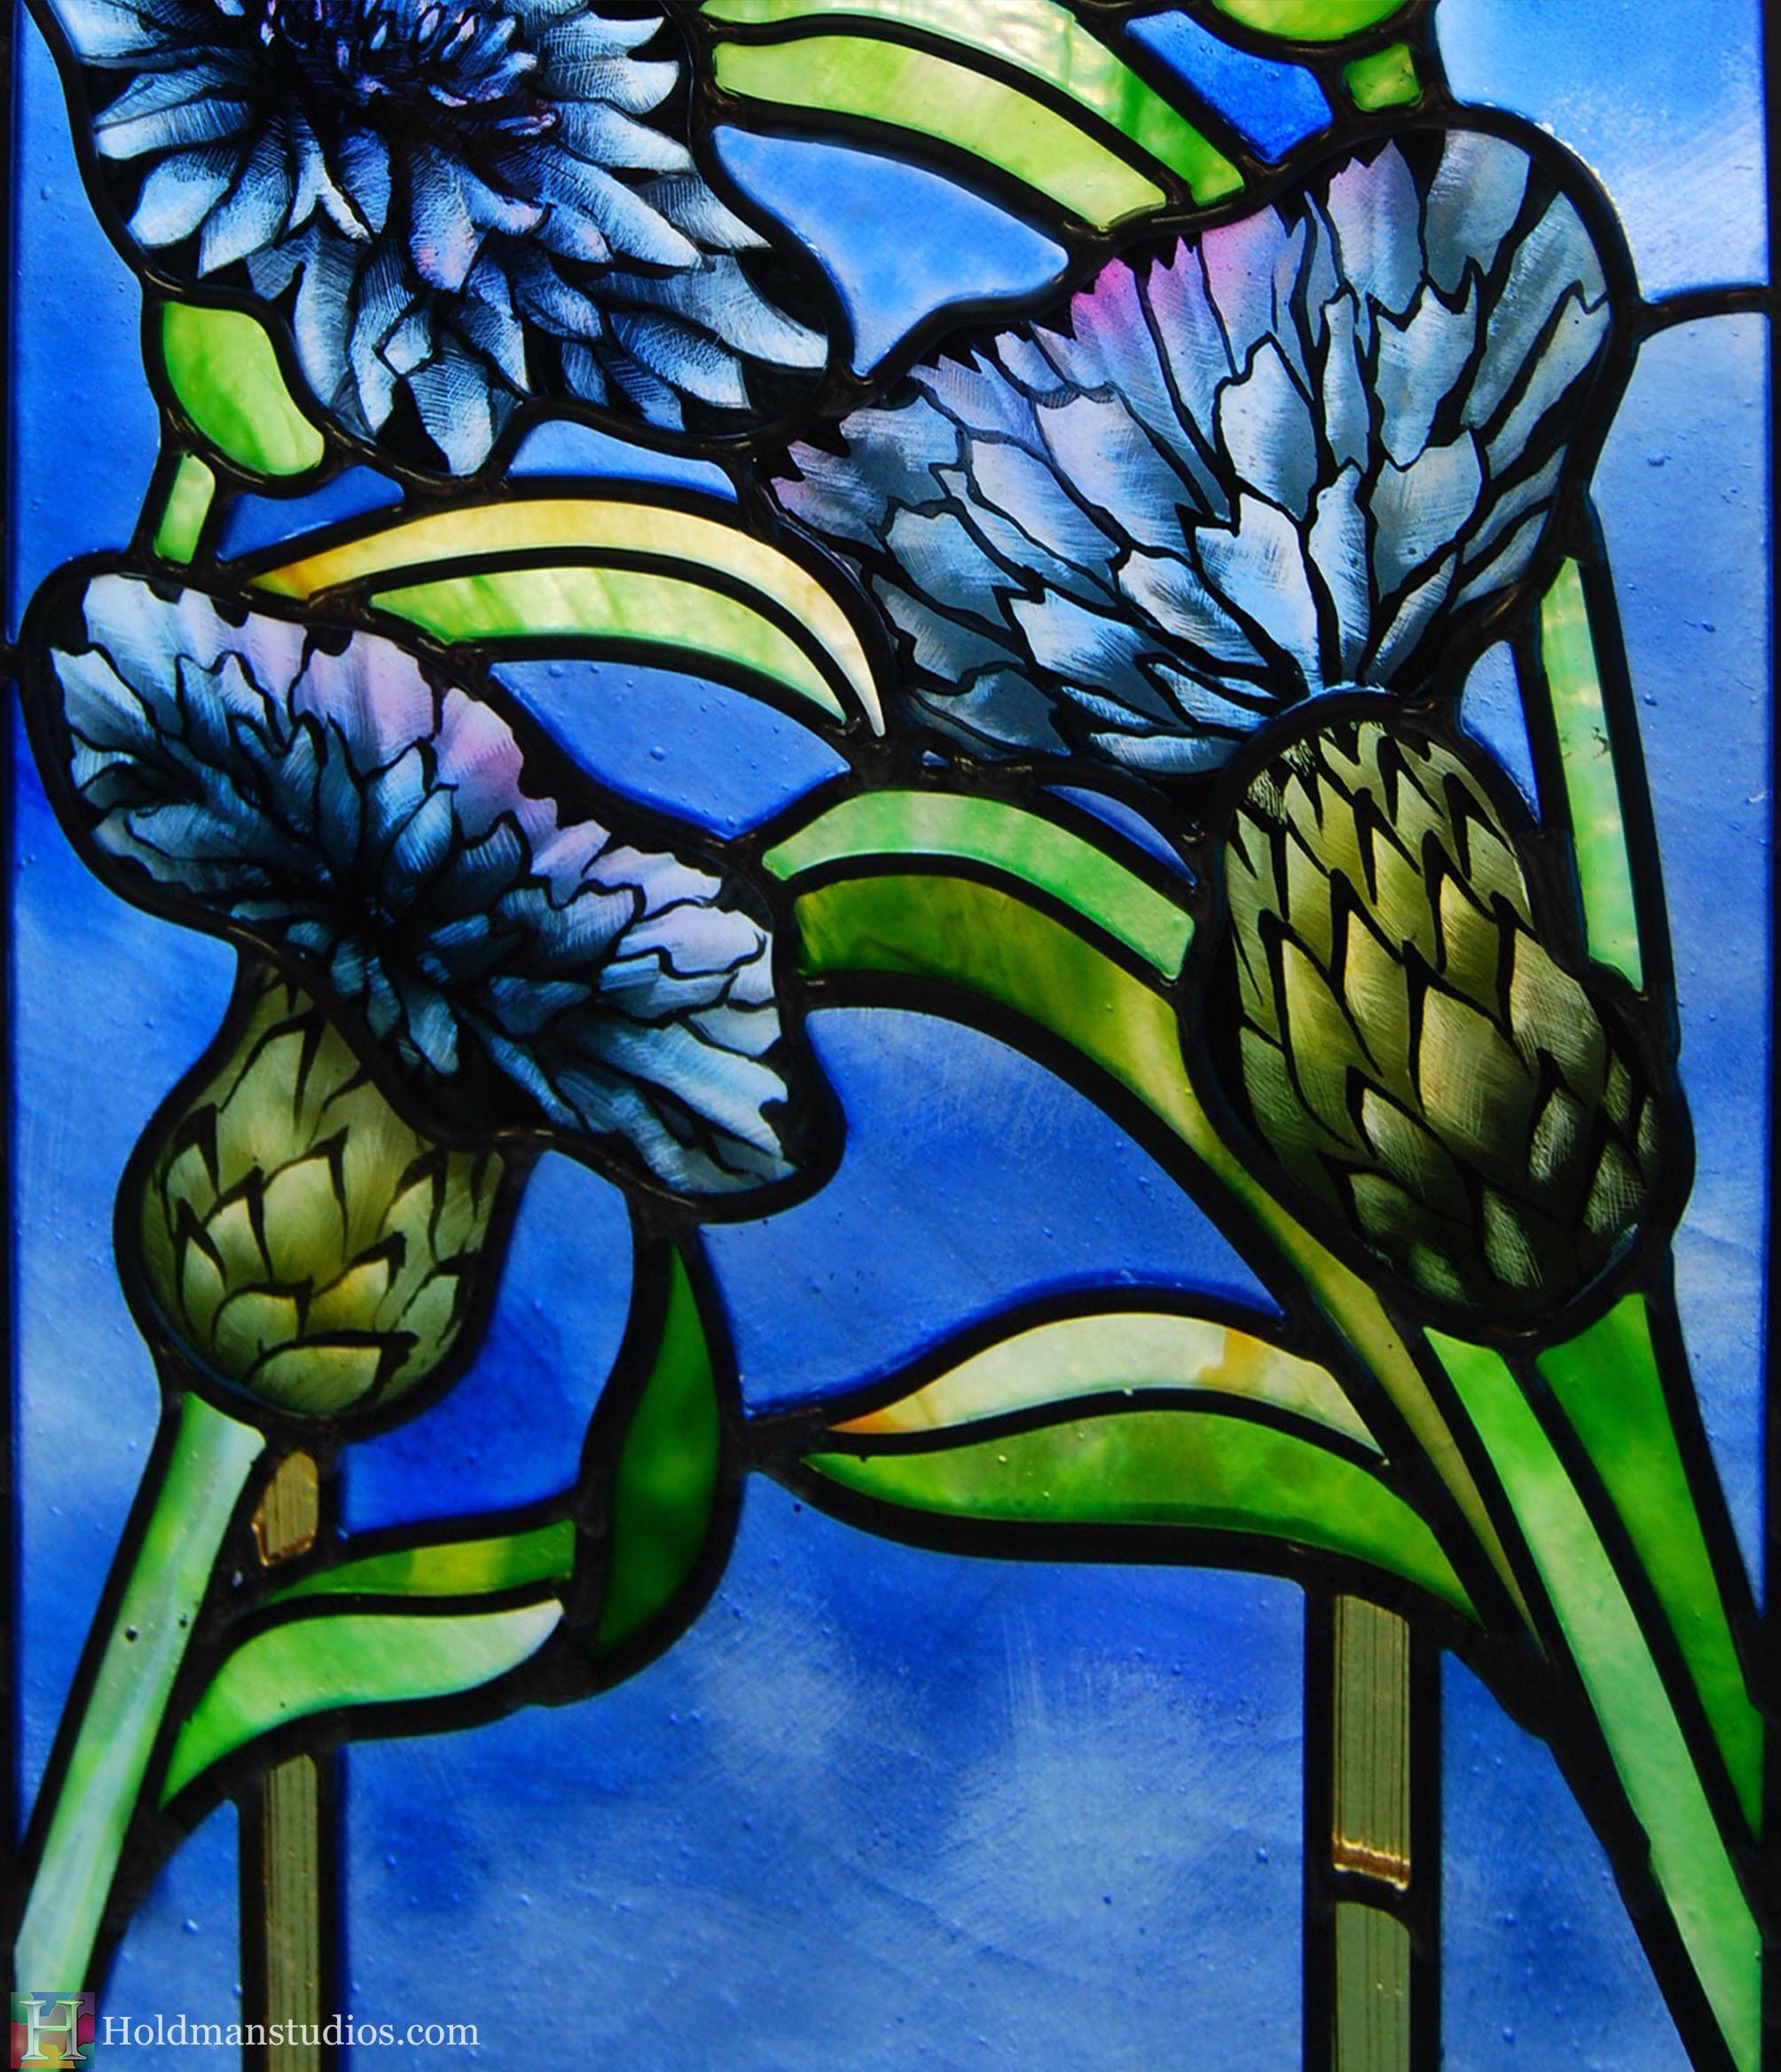 Holdman-Studios-Stained-Glass-Paris-LDS-Temple-Cornflower-Blue-Lily-Flowers-Leaves-Crop-Windows.jpg